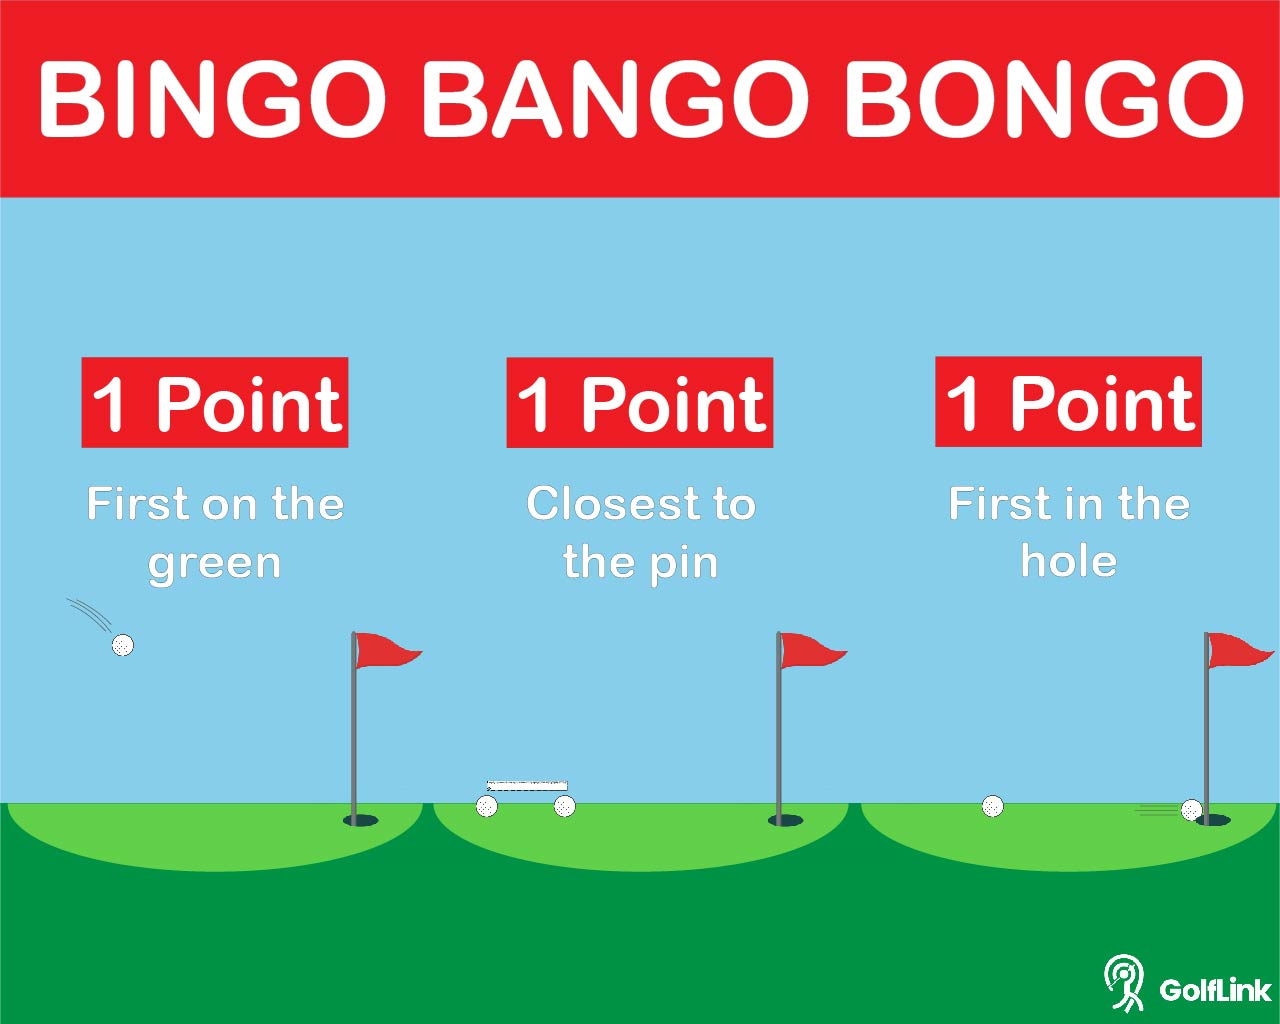 bingo bango bongo golf game